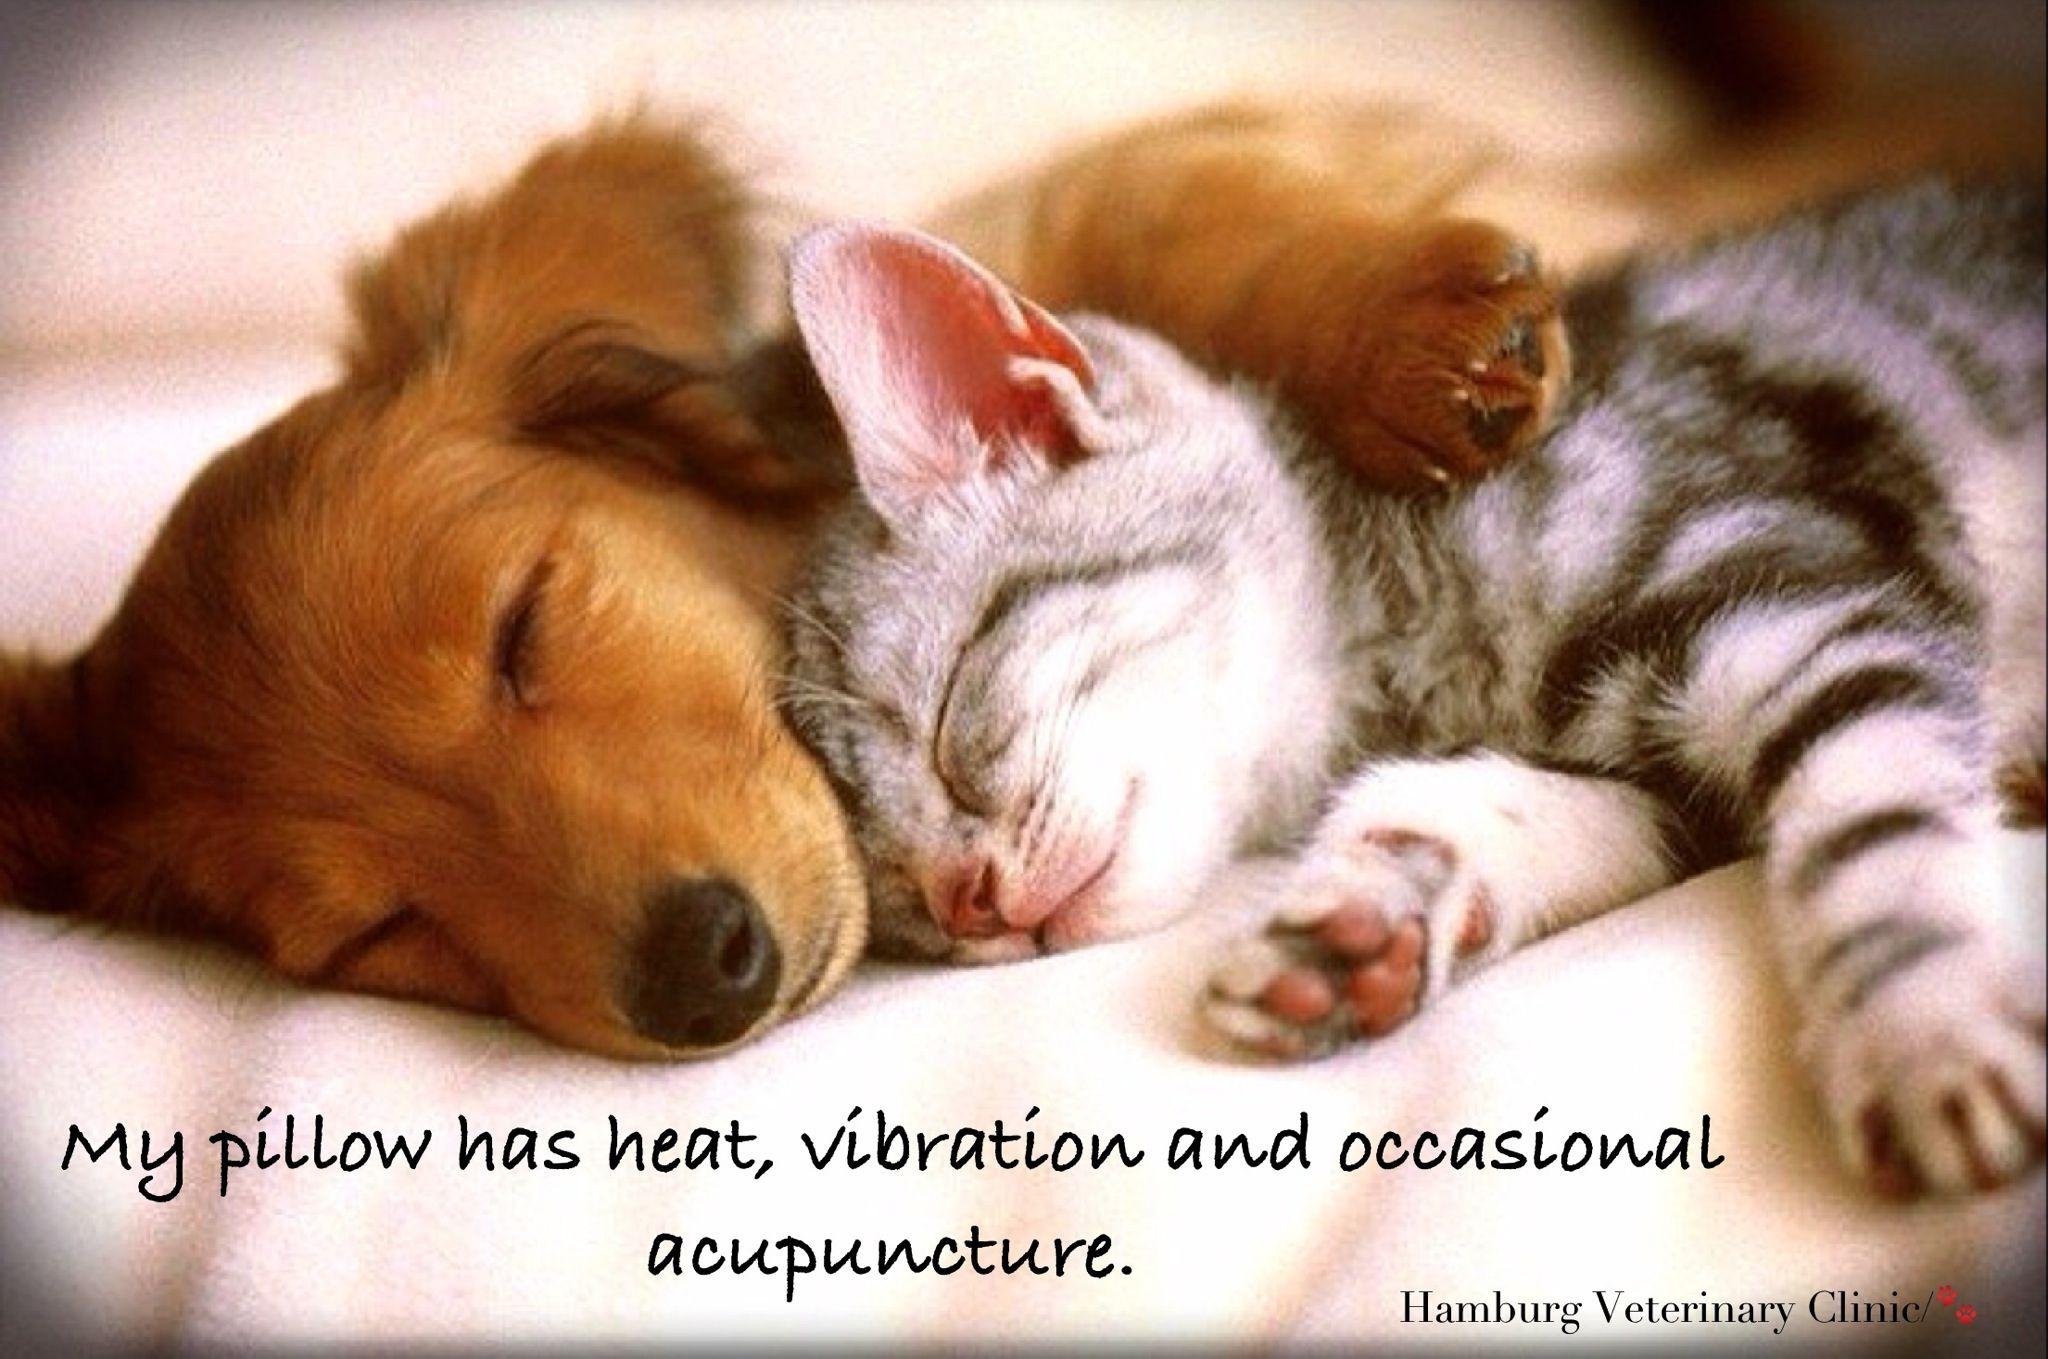 Good Night Sweet Dreams Animals Sleeping Together Cute Dog